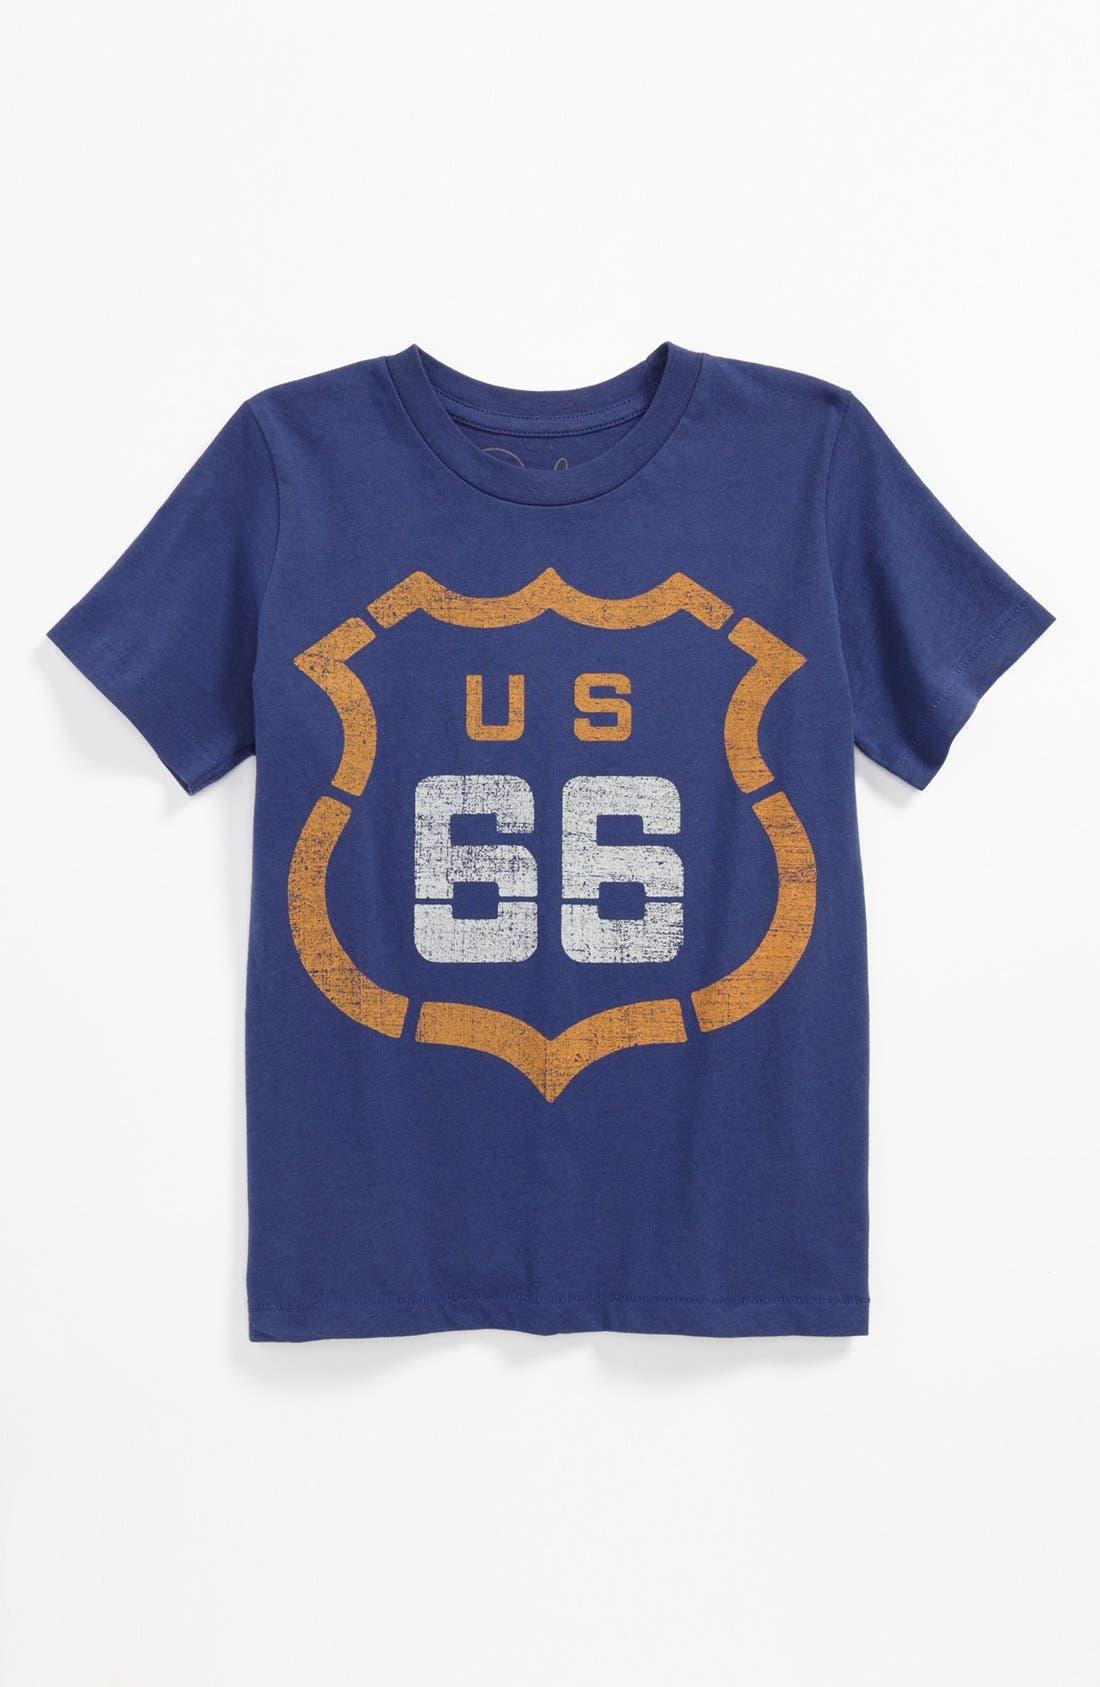 Alternate Image 1 Selected - Peek 'Route 66' T-Shirt (Big Boys)